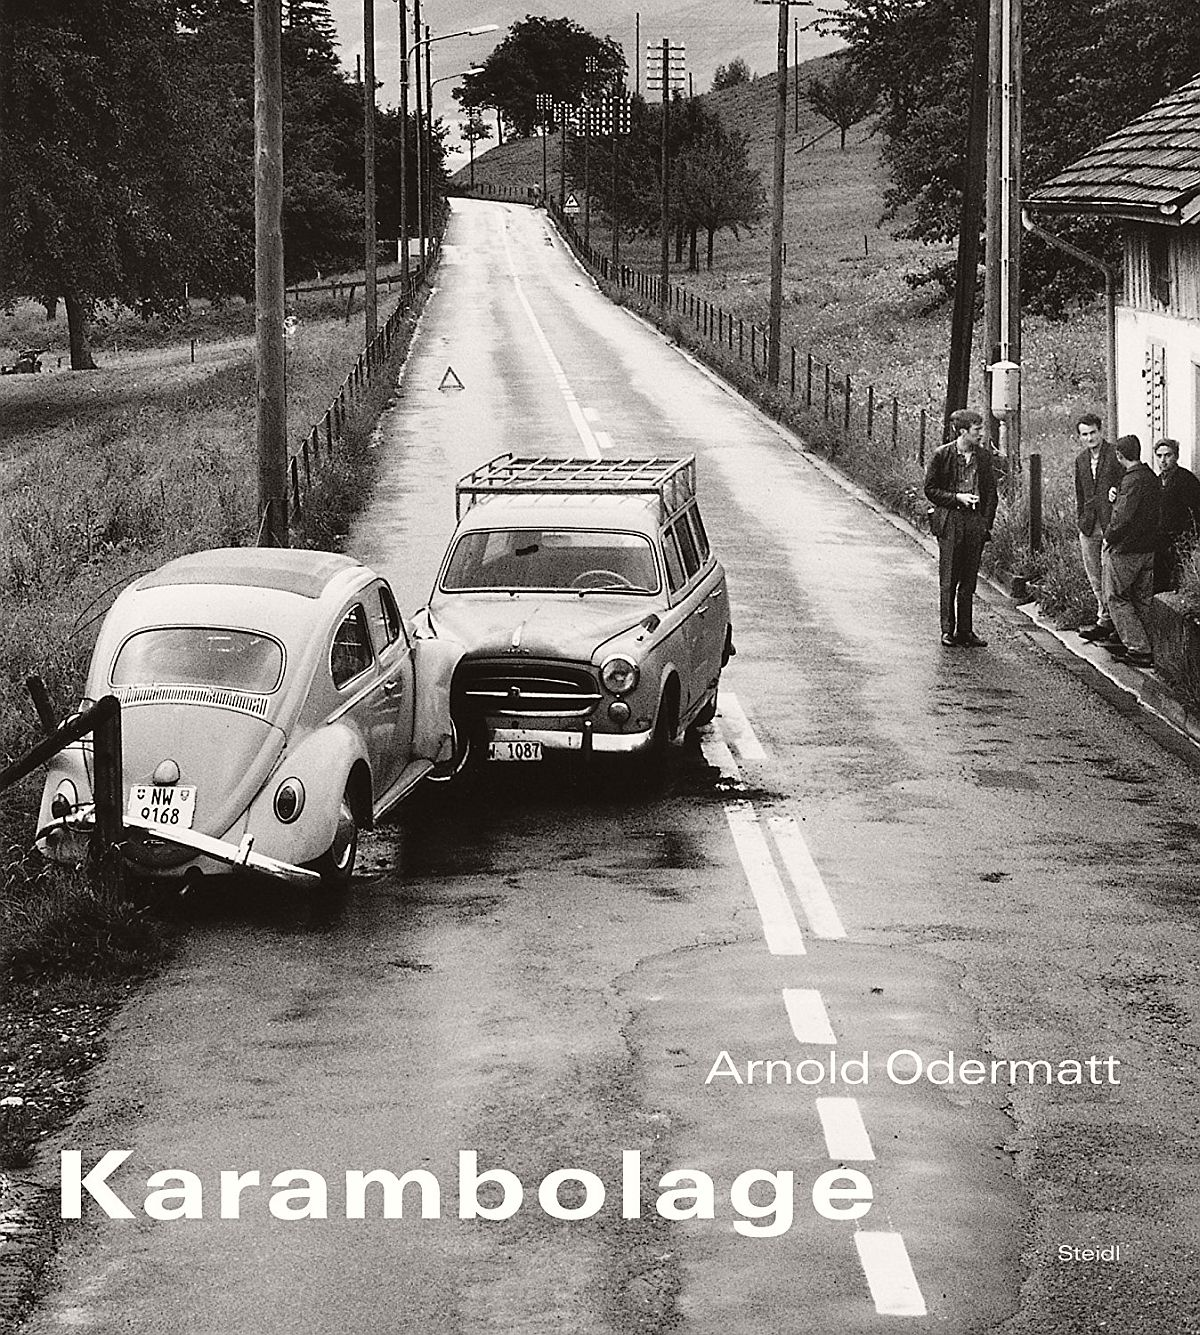 © Arnold Odermatt: Karambolage